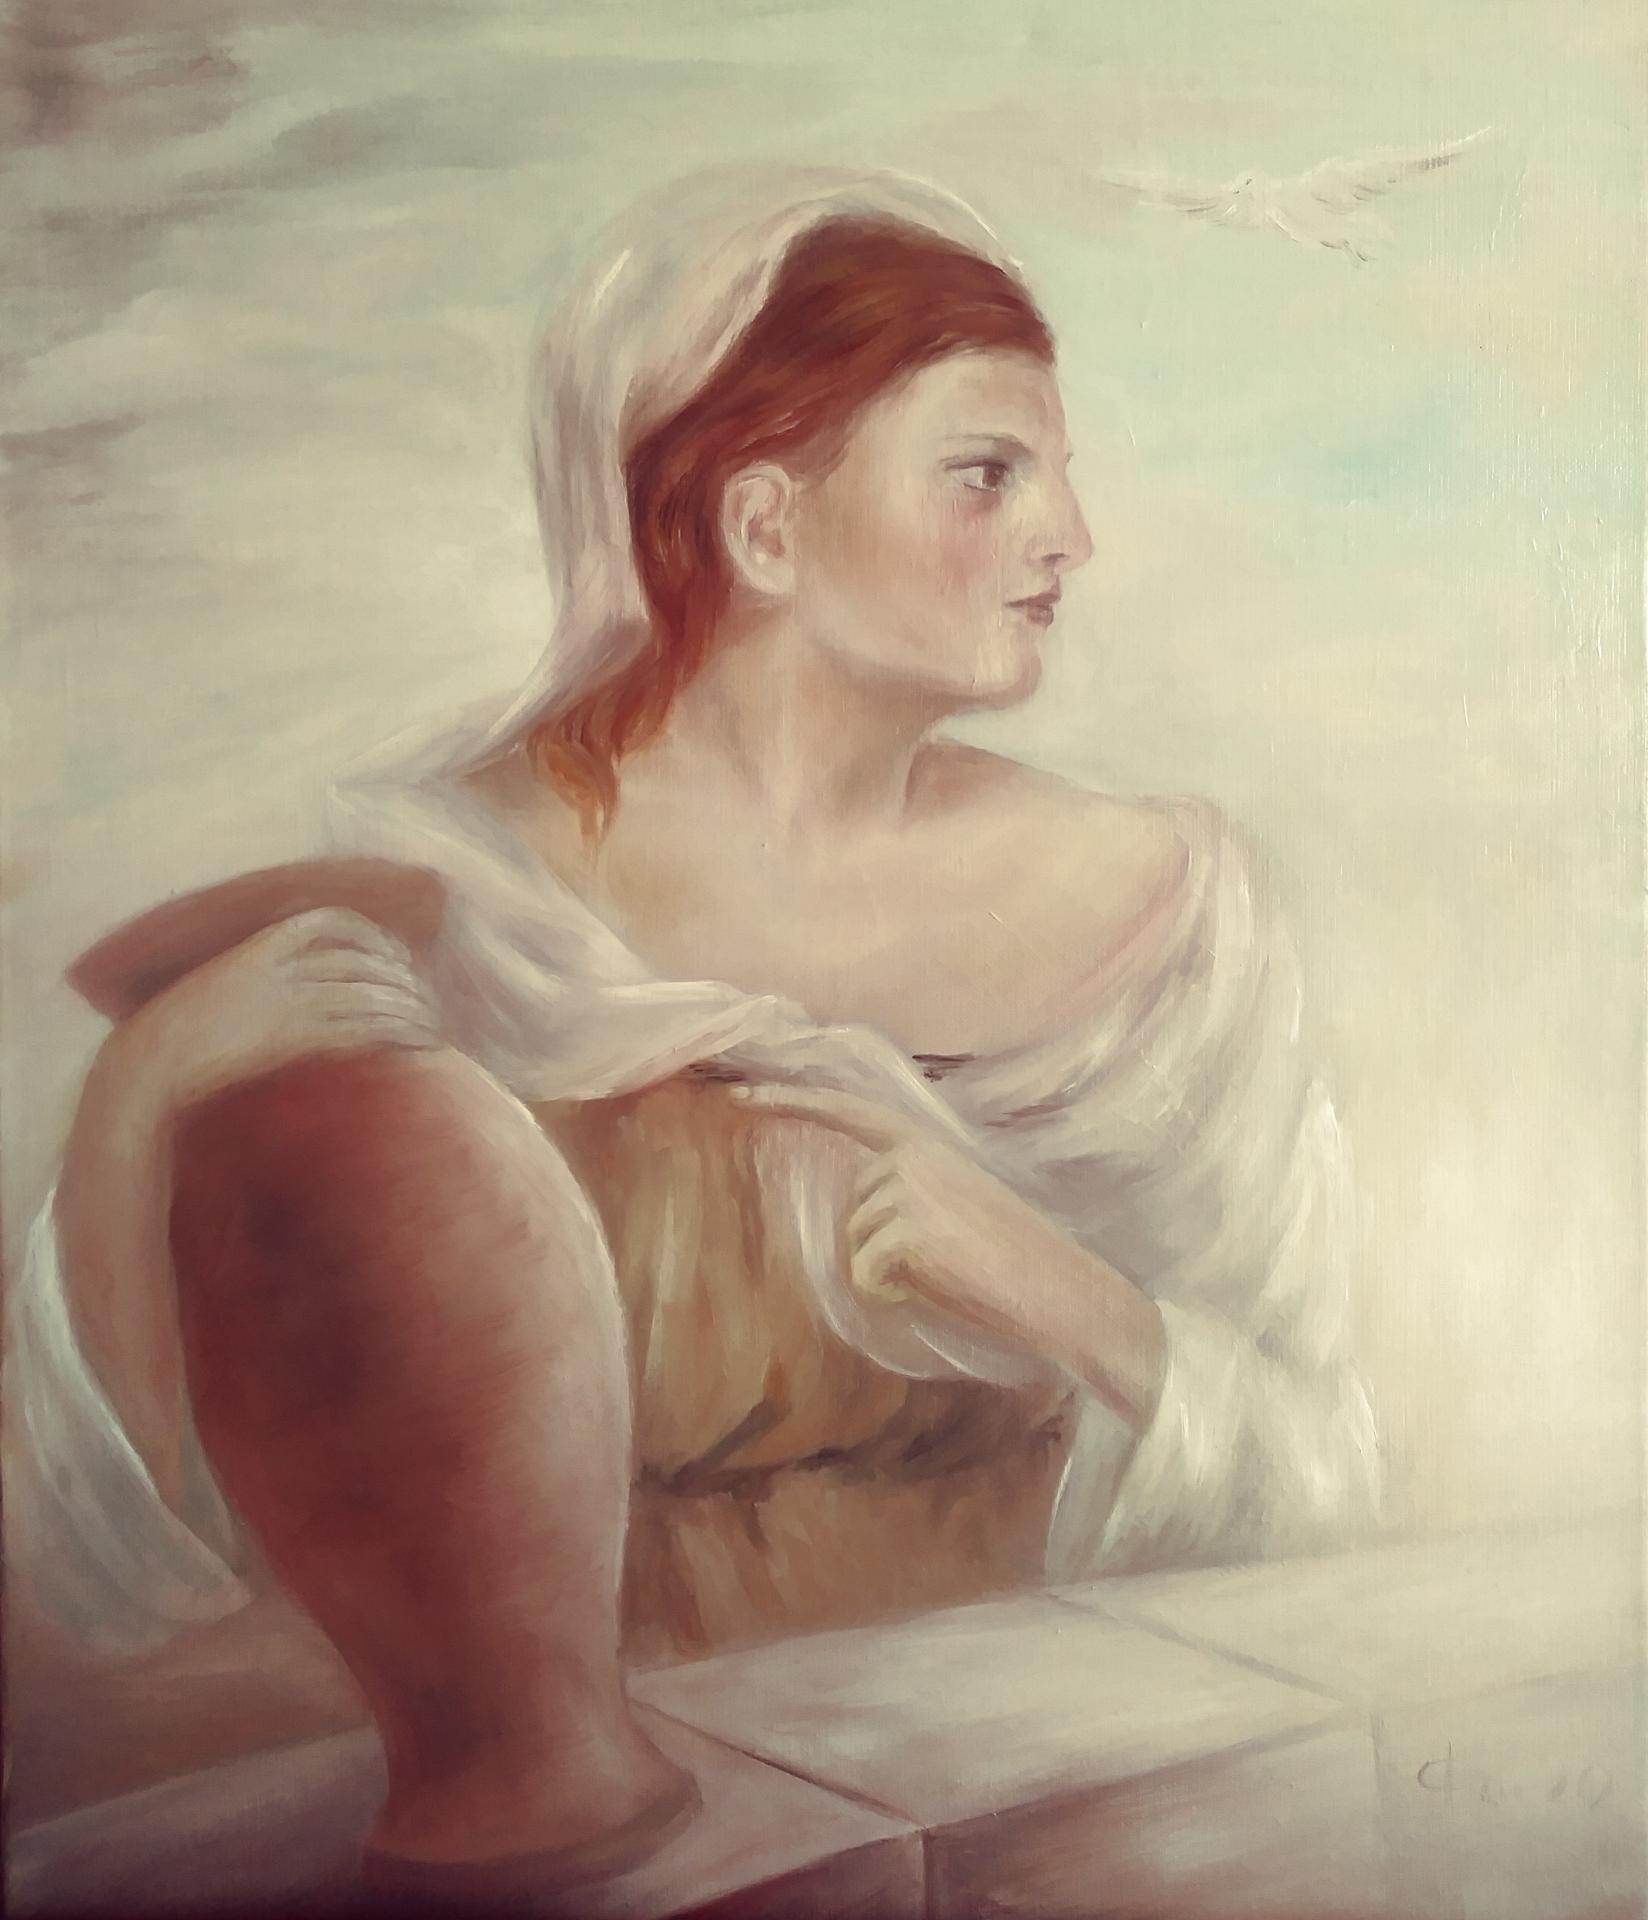 La samaritaine peinture a l huile de jean joseph chevalier